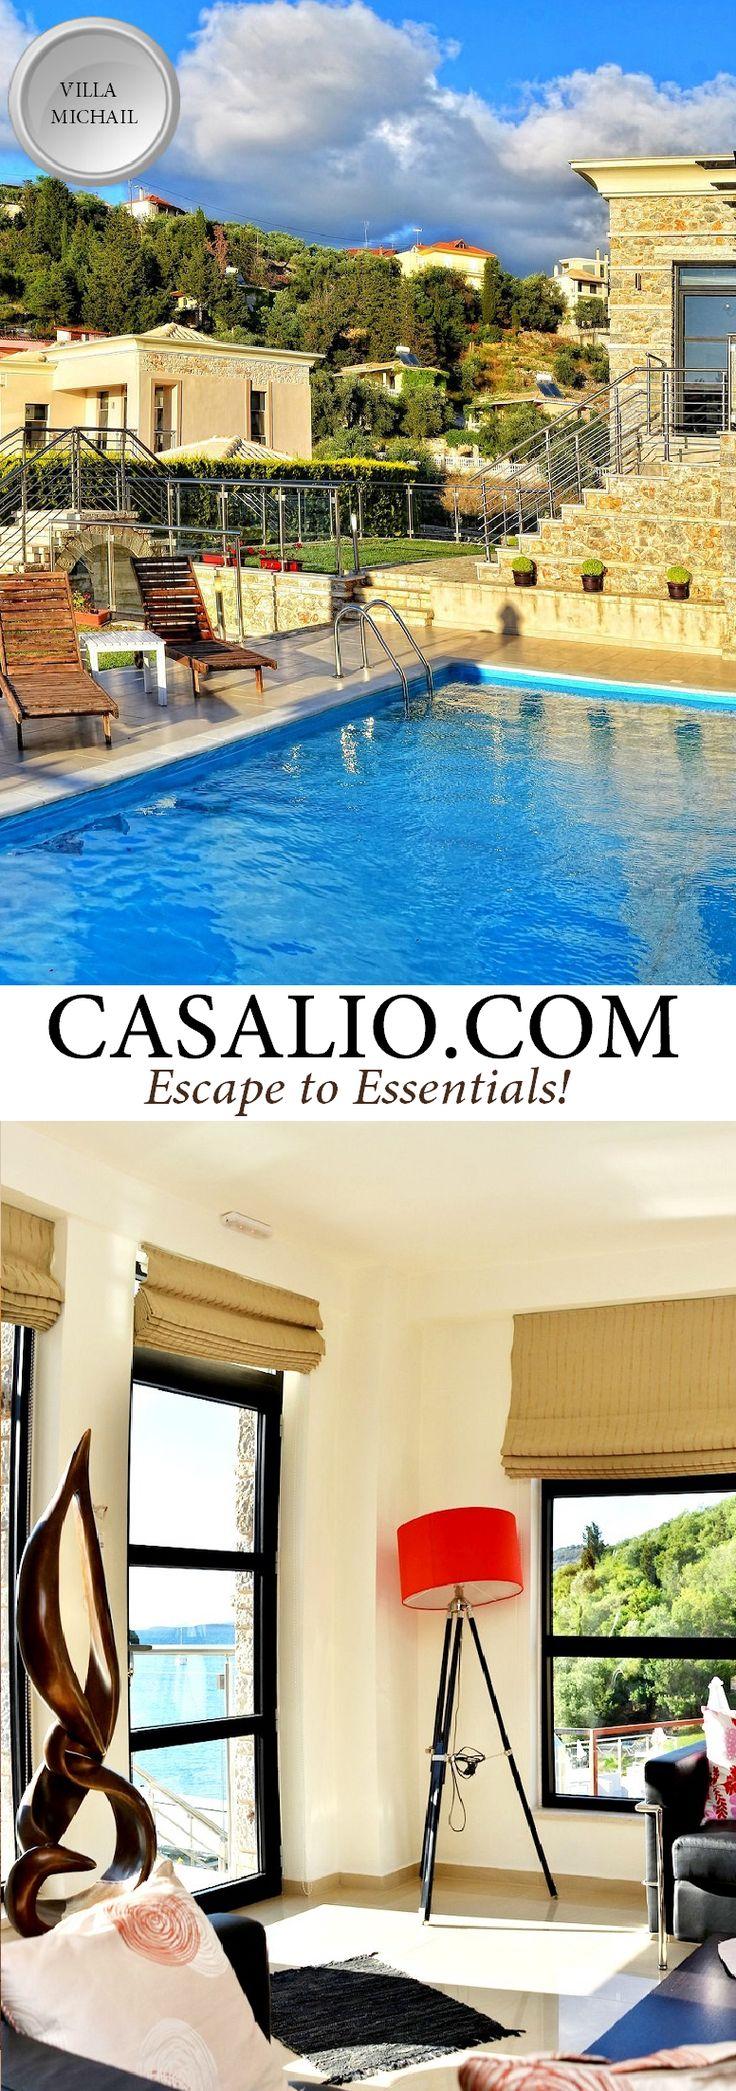 www.casalio.com || Villa Michail || Greece - Karvouno || Luxurious villa, fully airconditioned, Karvouno Beach, 2 bedrooms, private pool, seaview. #Luxury #Villas #LuxuryVillas #Greece #Karvouno #BeachFront #BeachVacation #Rental #LuxuryTravel #Travel #LuxuryLife #LuxuryLifeStyle #LuxuryTravel #luxuryhotels (Pinned by #Casalio - www.casalio.com) Our travel blog - www.casaliotravel.com